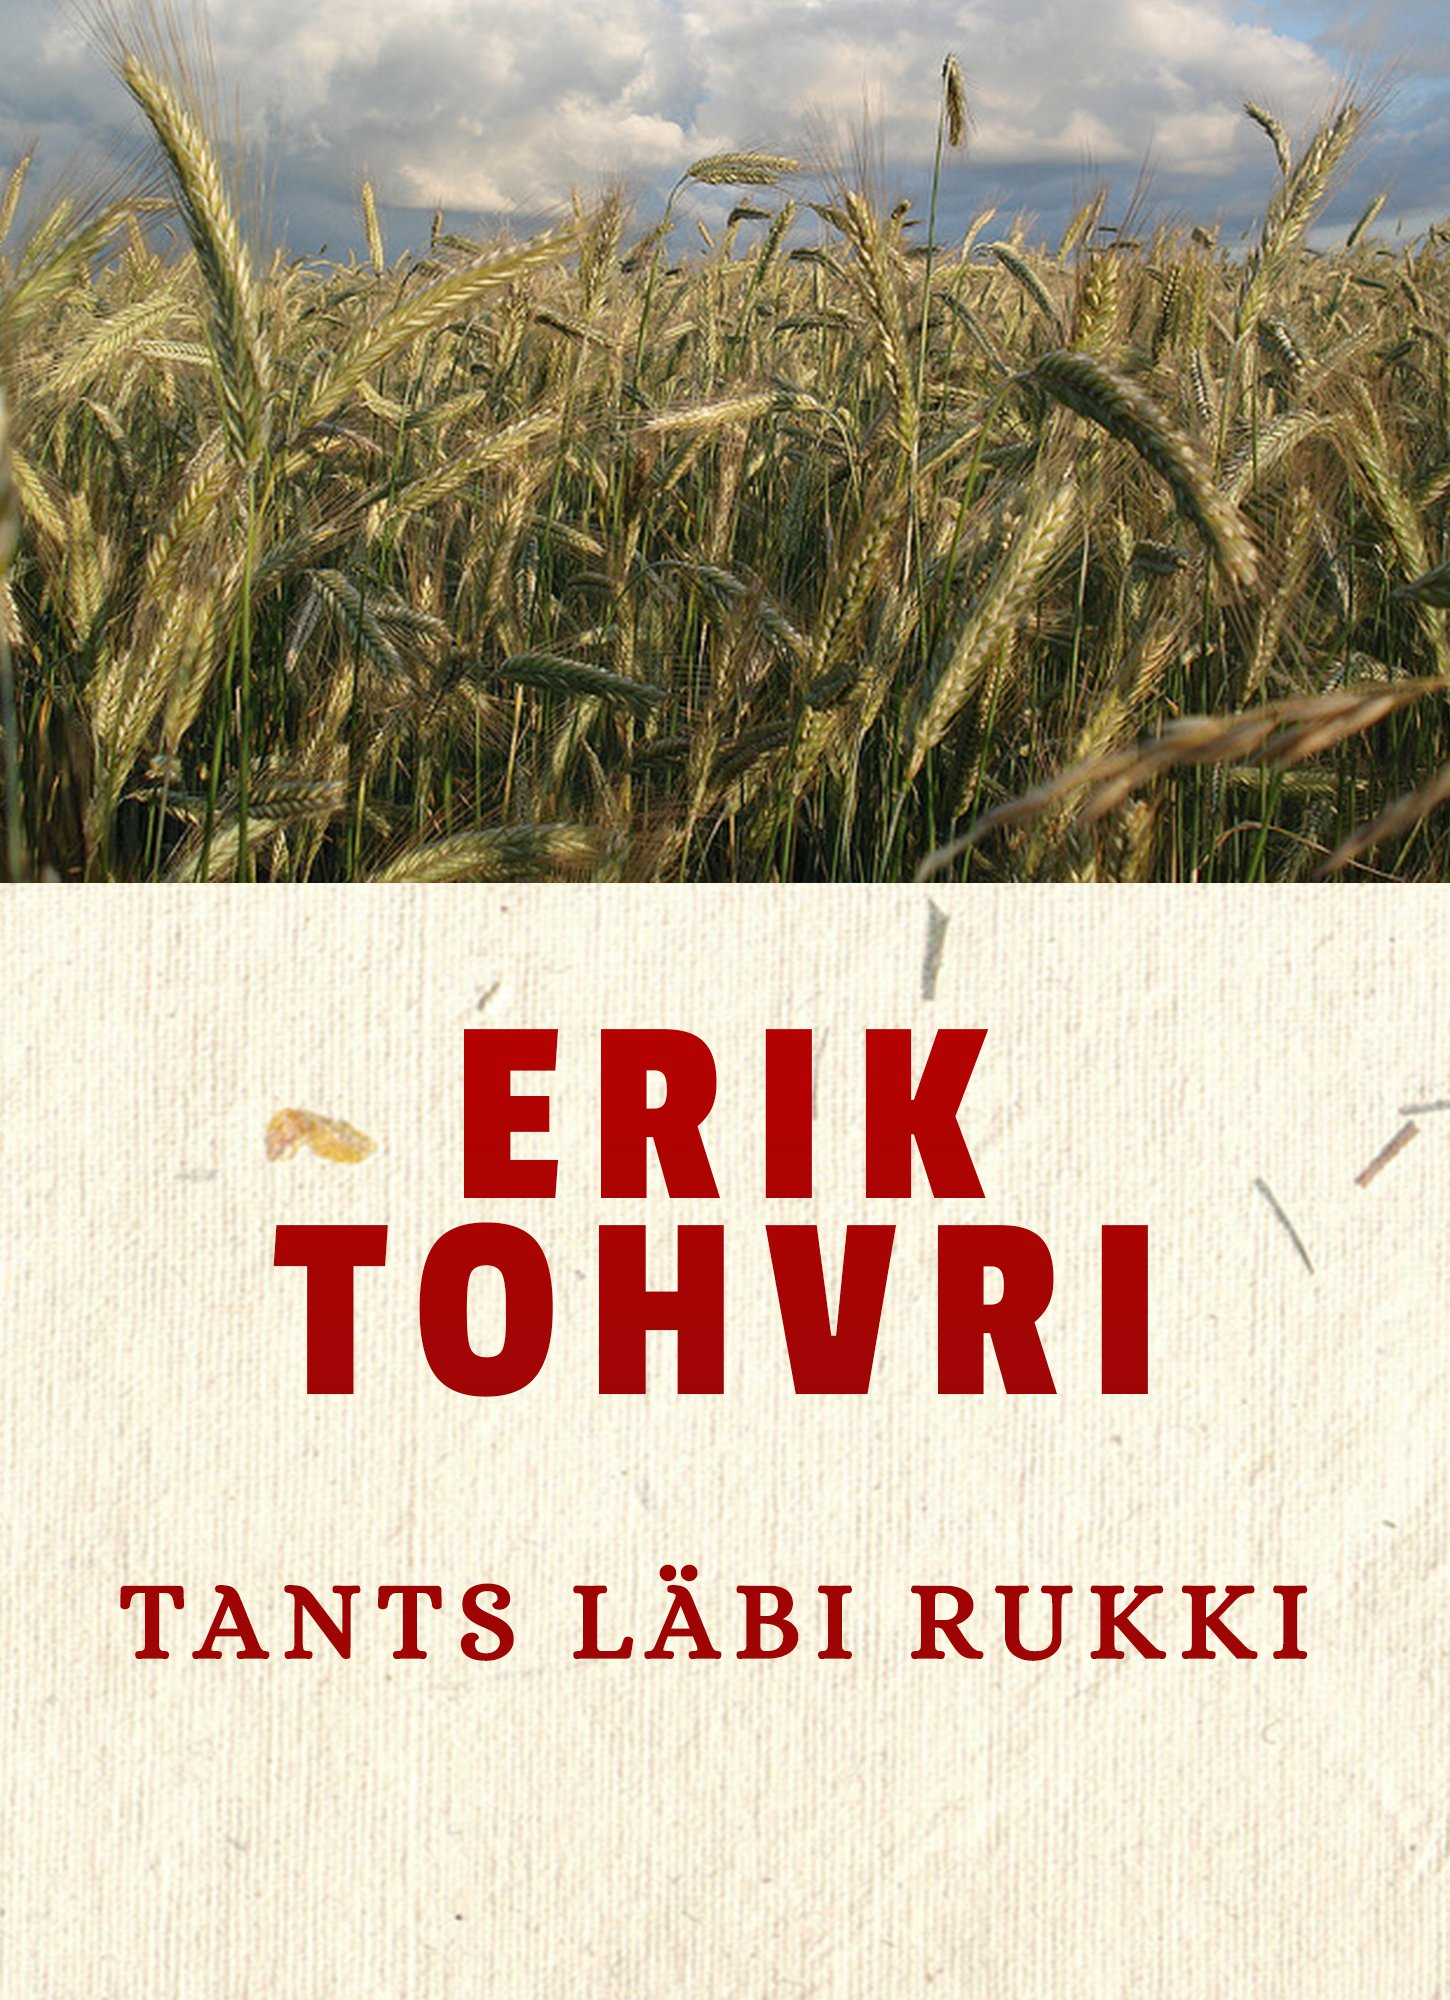 Erik Tohvri Tants läbi rukki erik tohvri kodutute küla ii sulasest sai peremees